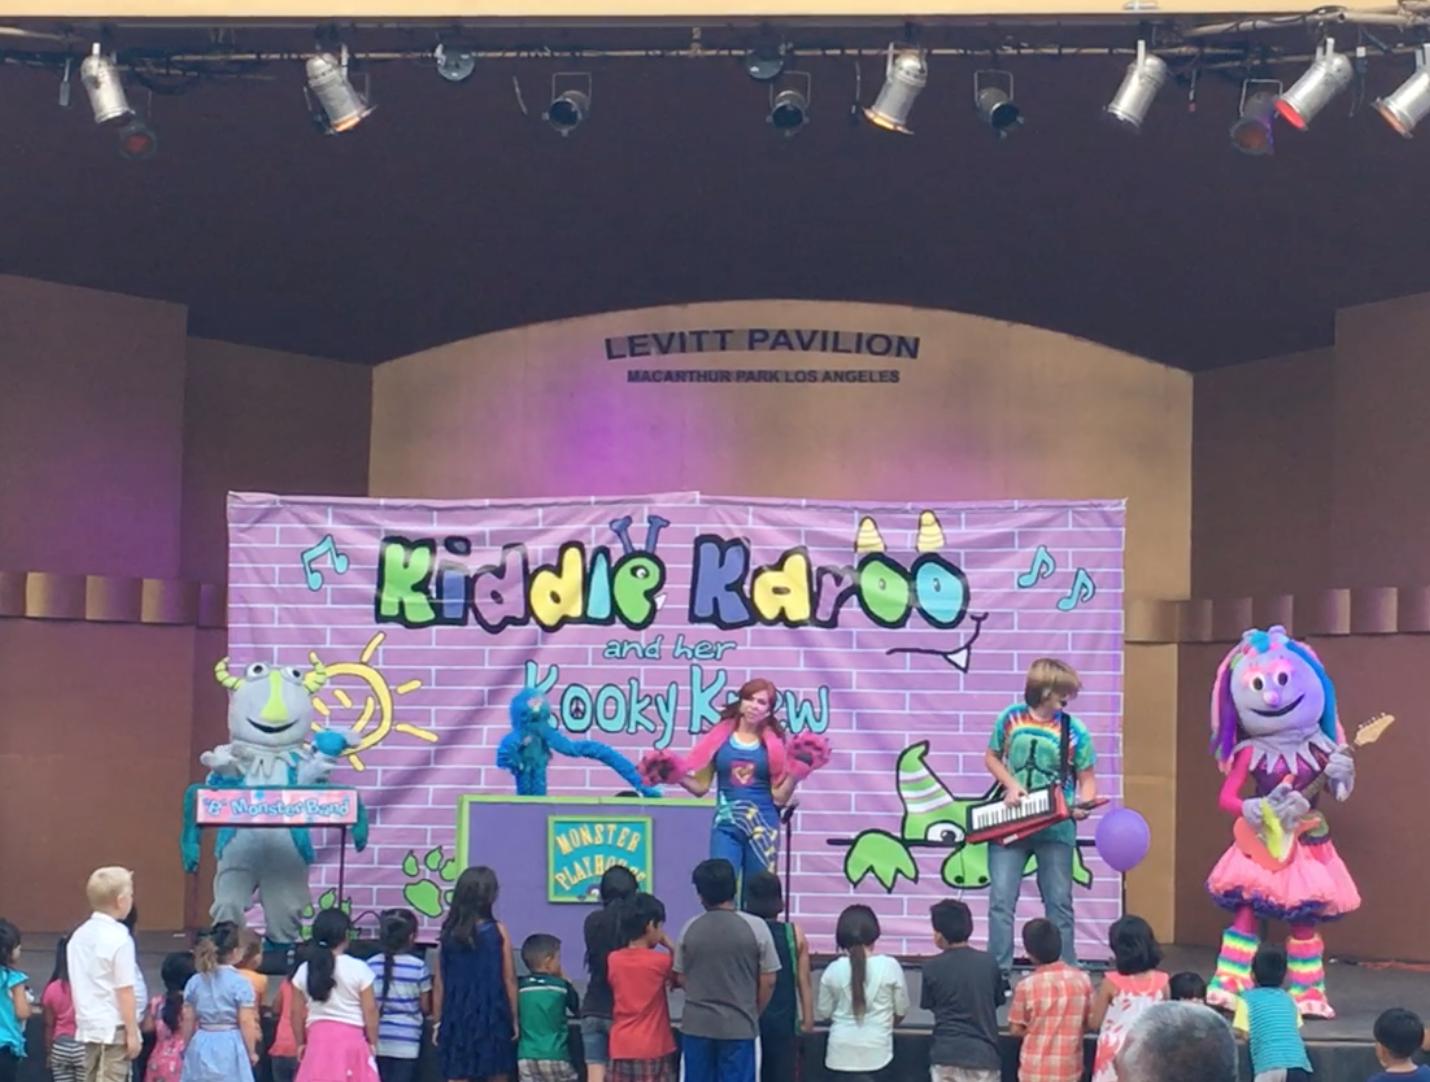 Kiddle Karoo Monster Kindierock conc